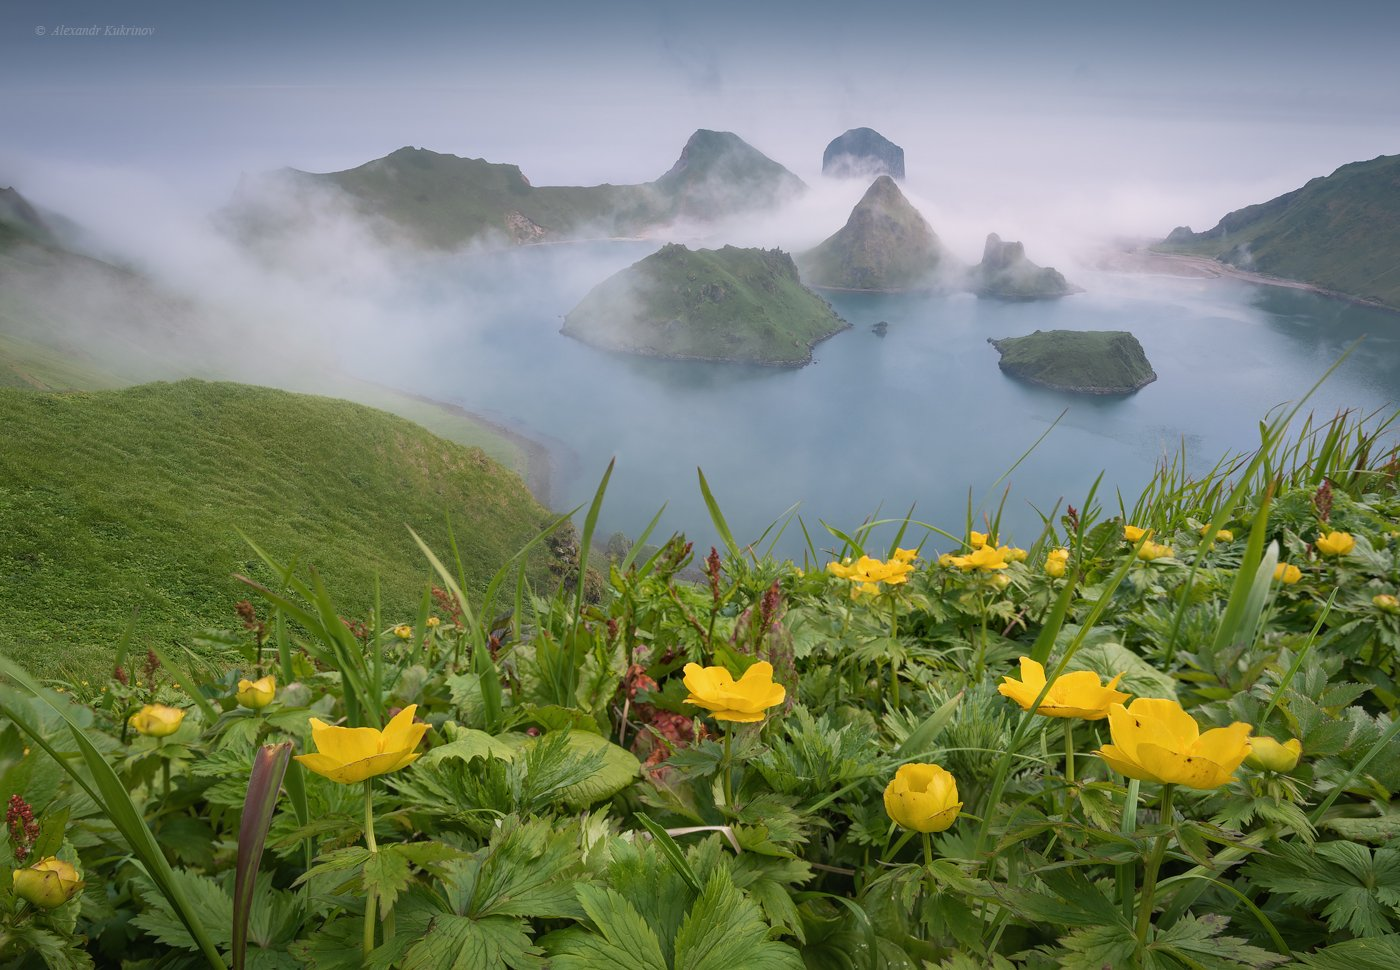 курилы, пейзаж, остров янкича, Александр Кукринов